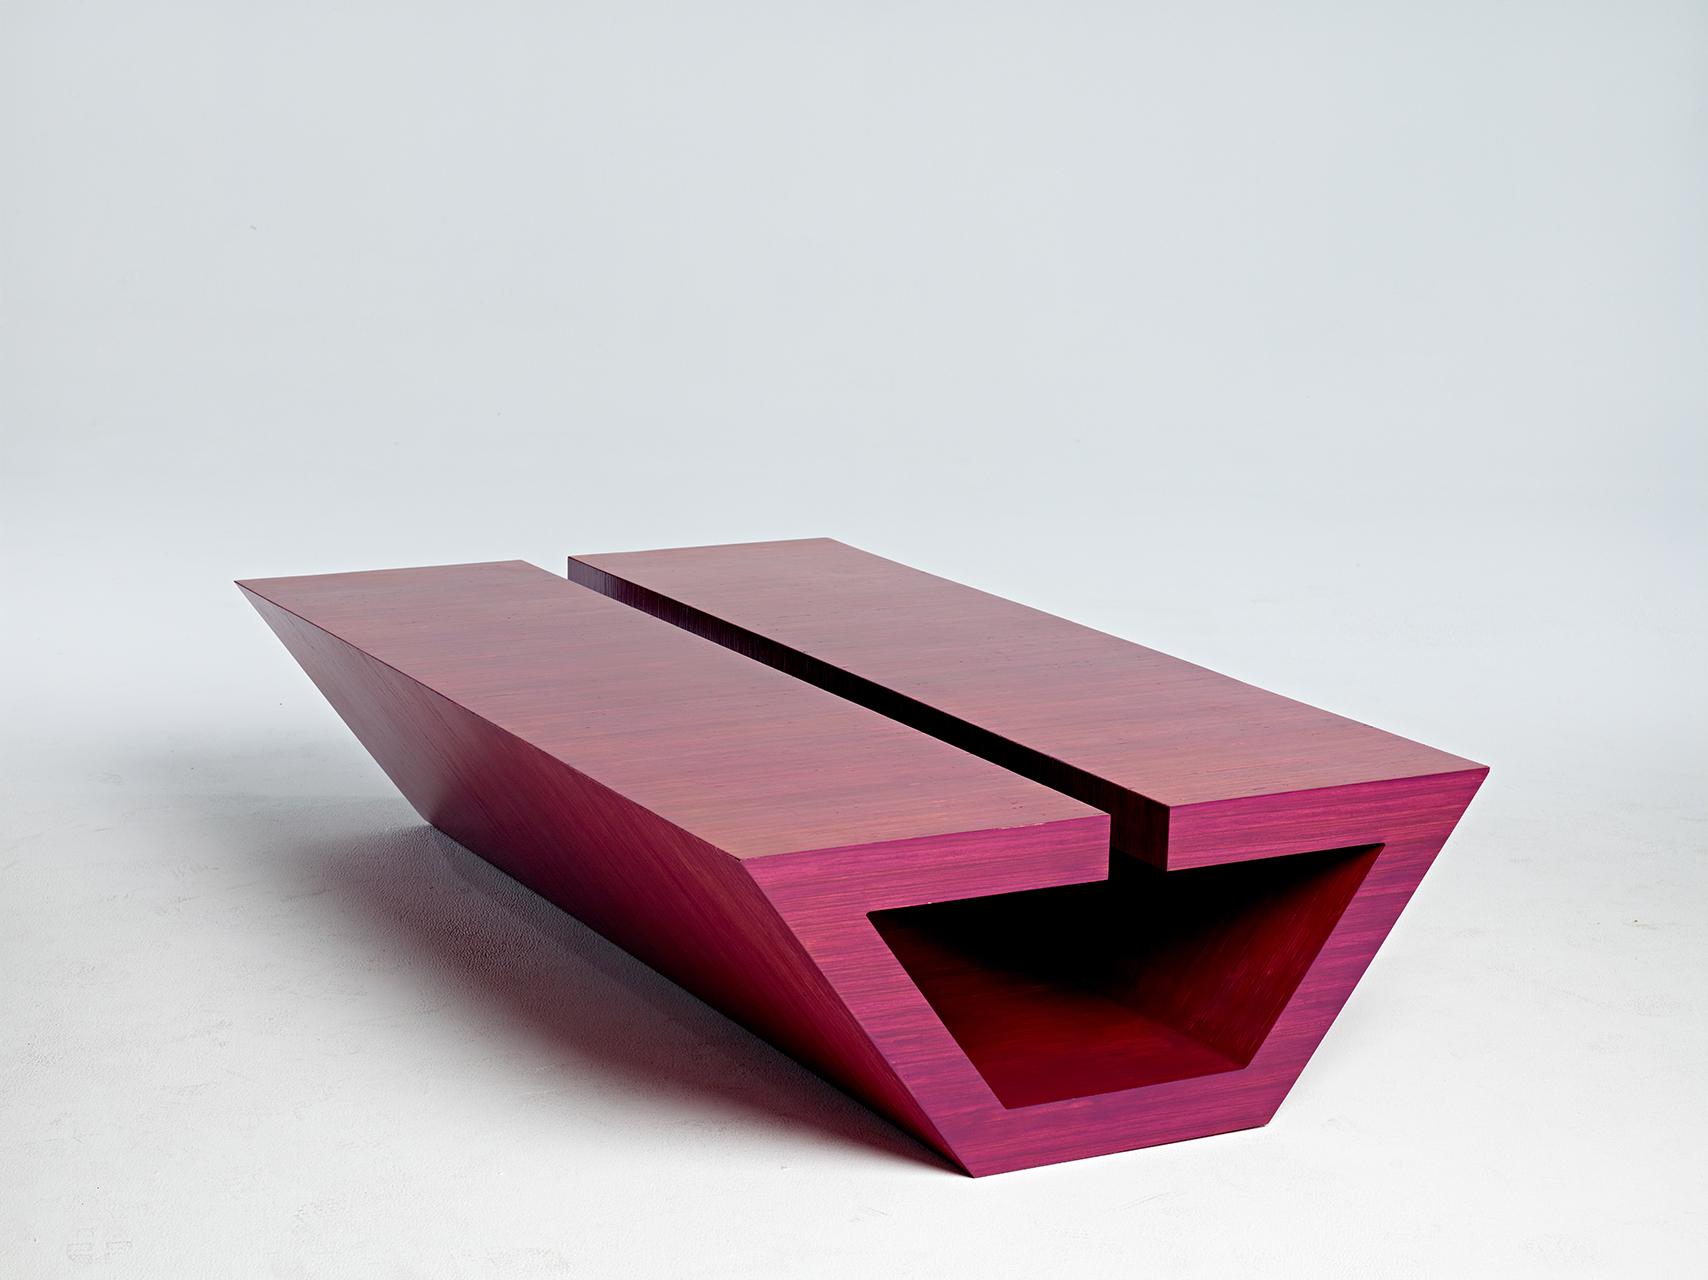 Scot Sardinha and Modern Earth Home's Pink Poui Table